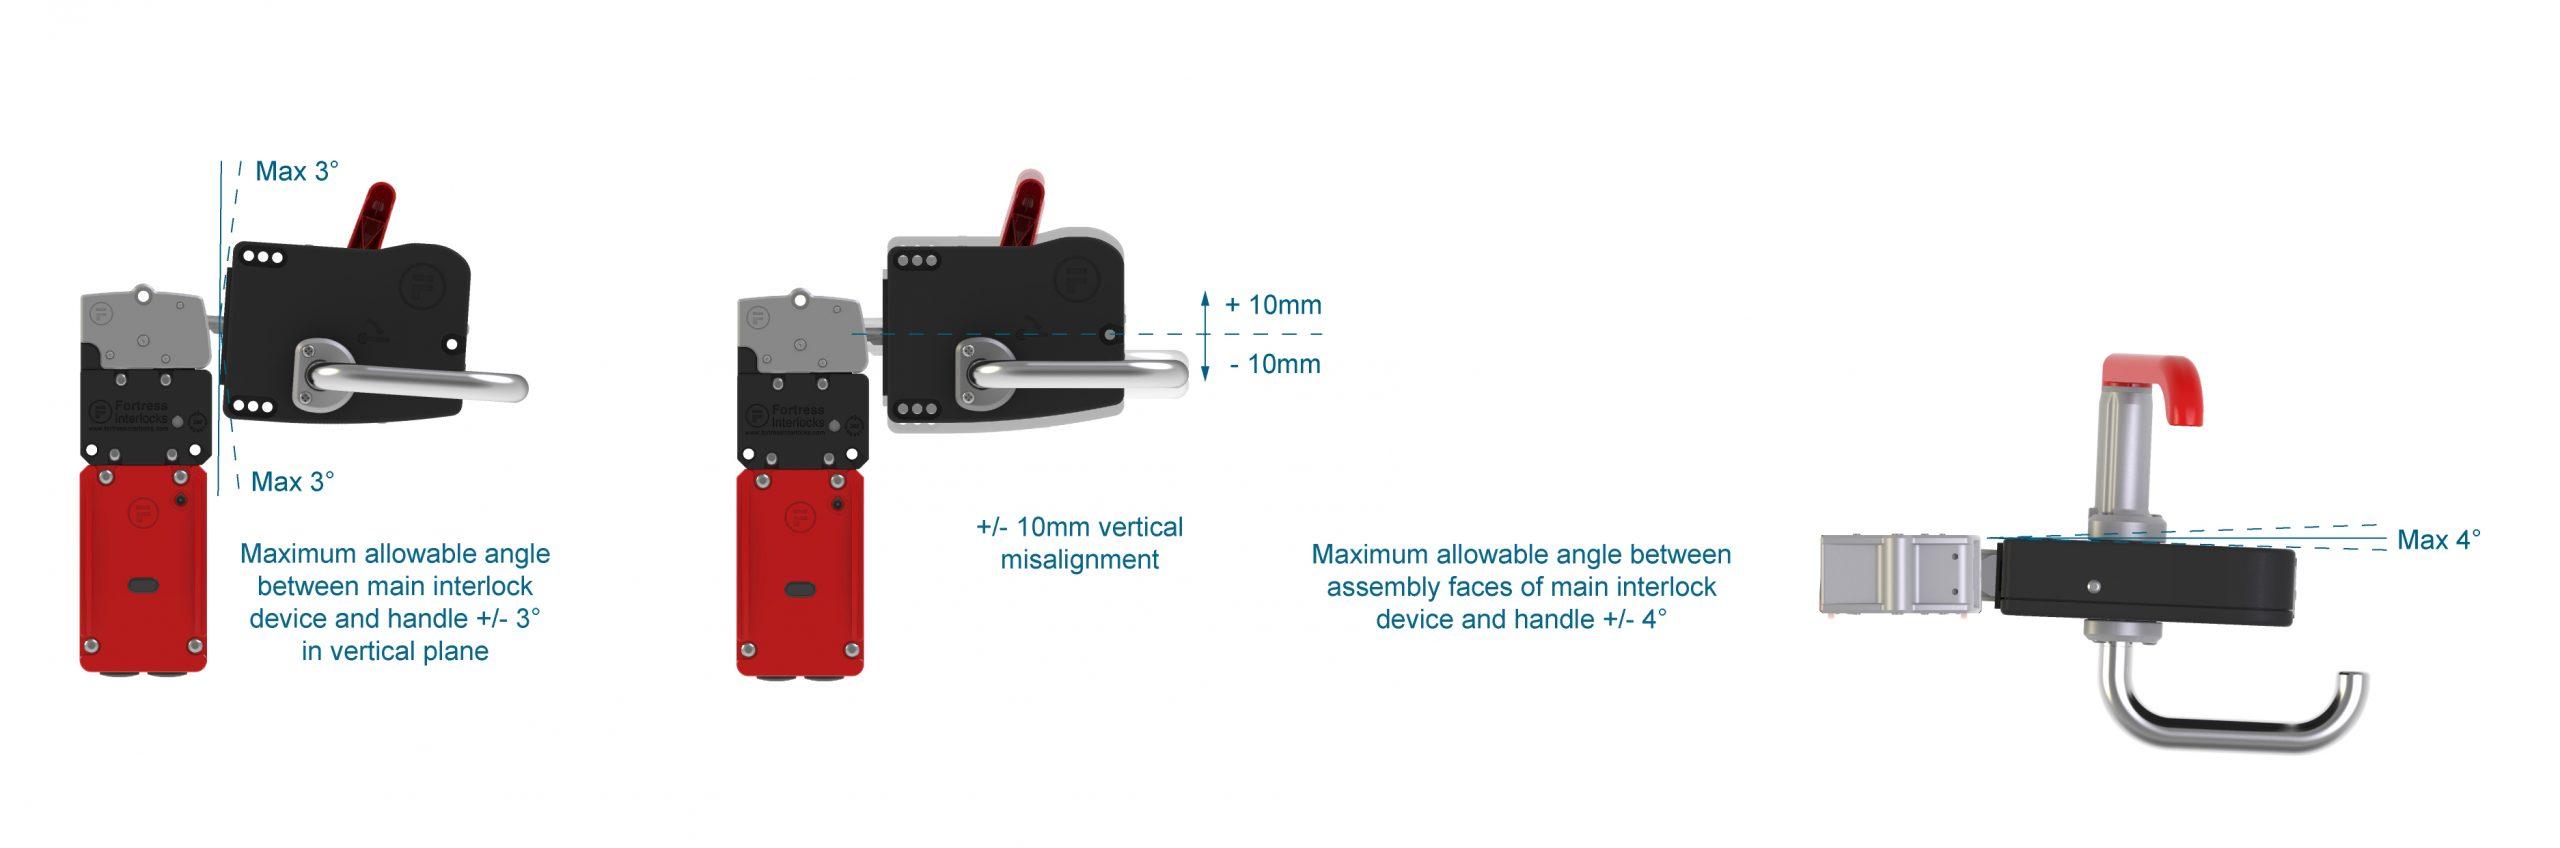 Actuator Misalignment Heavy Duty Actuators